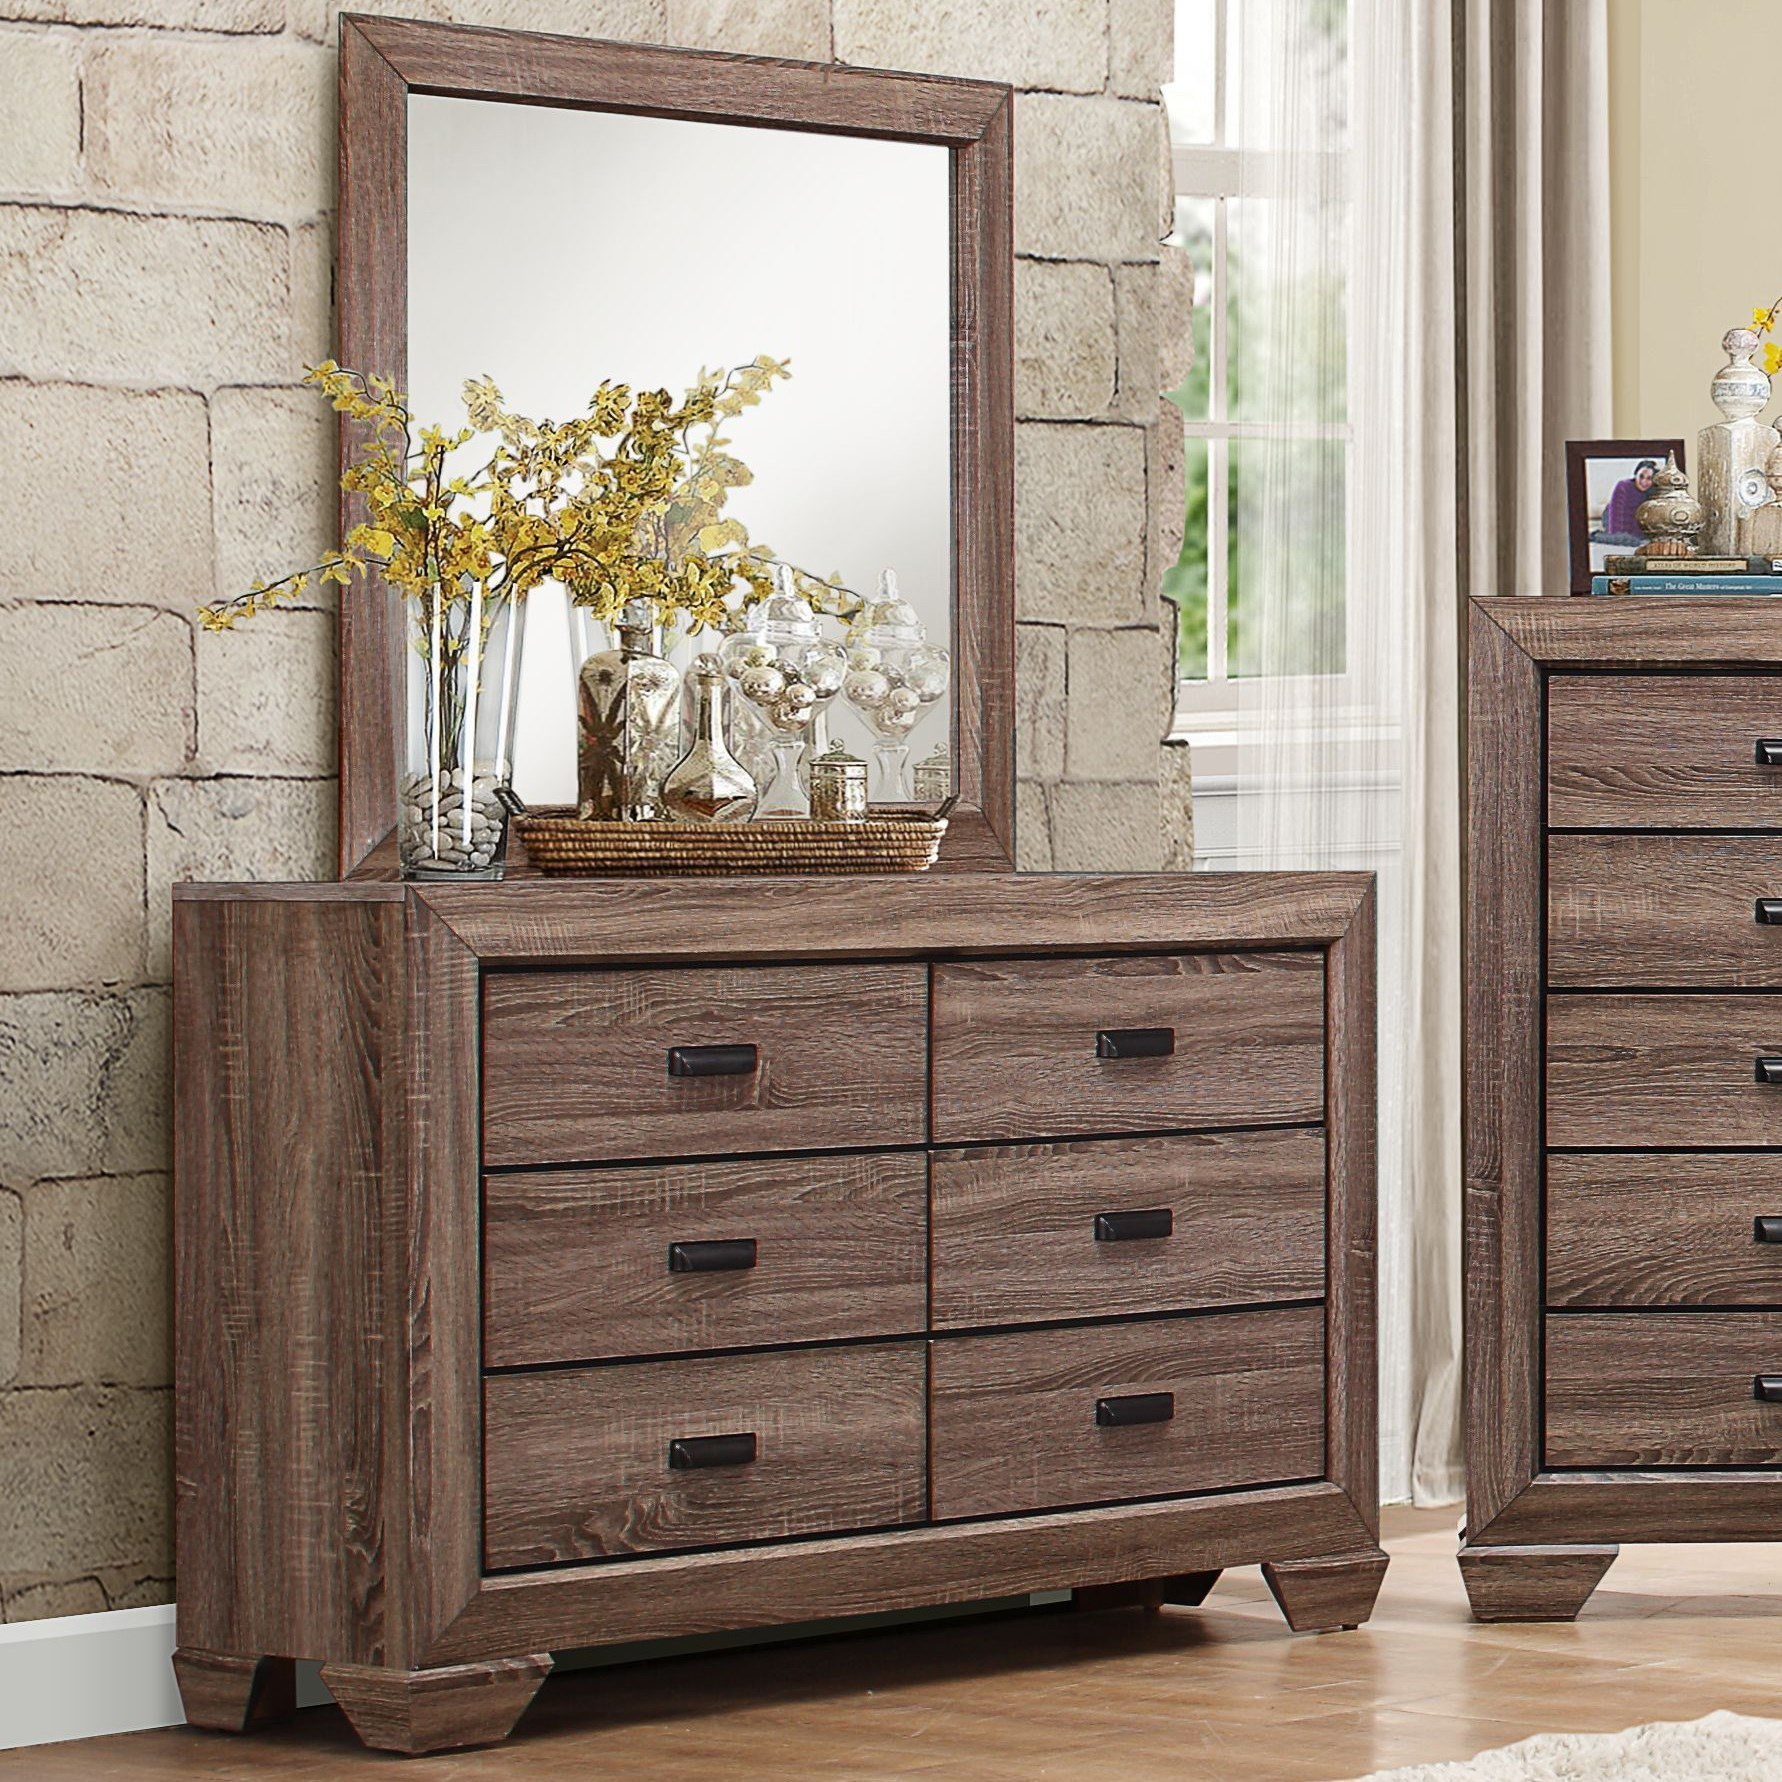 Homelegance Beechnut Modern 6-Drawer Dresser and Mirror - Item Number: 1904-5+6